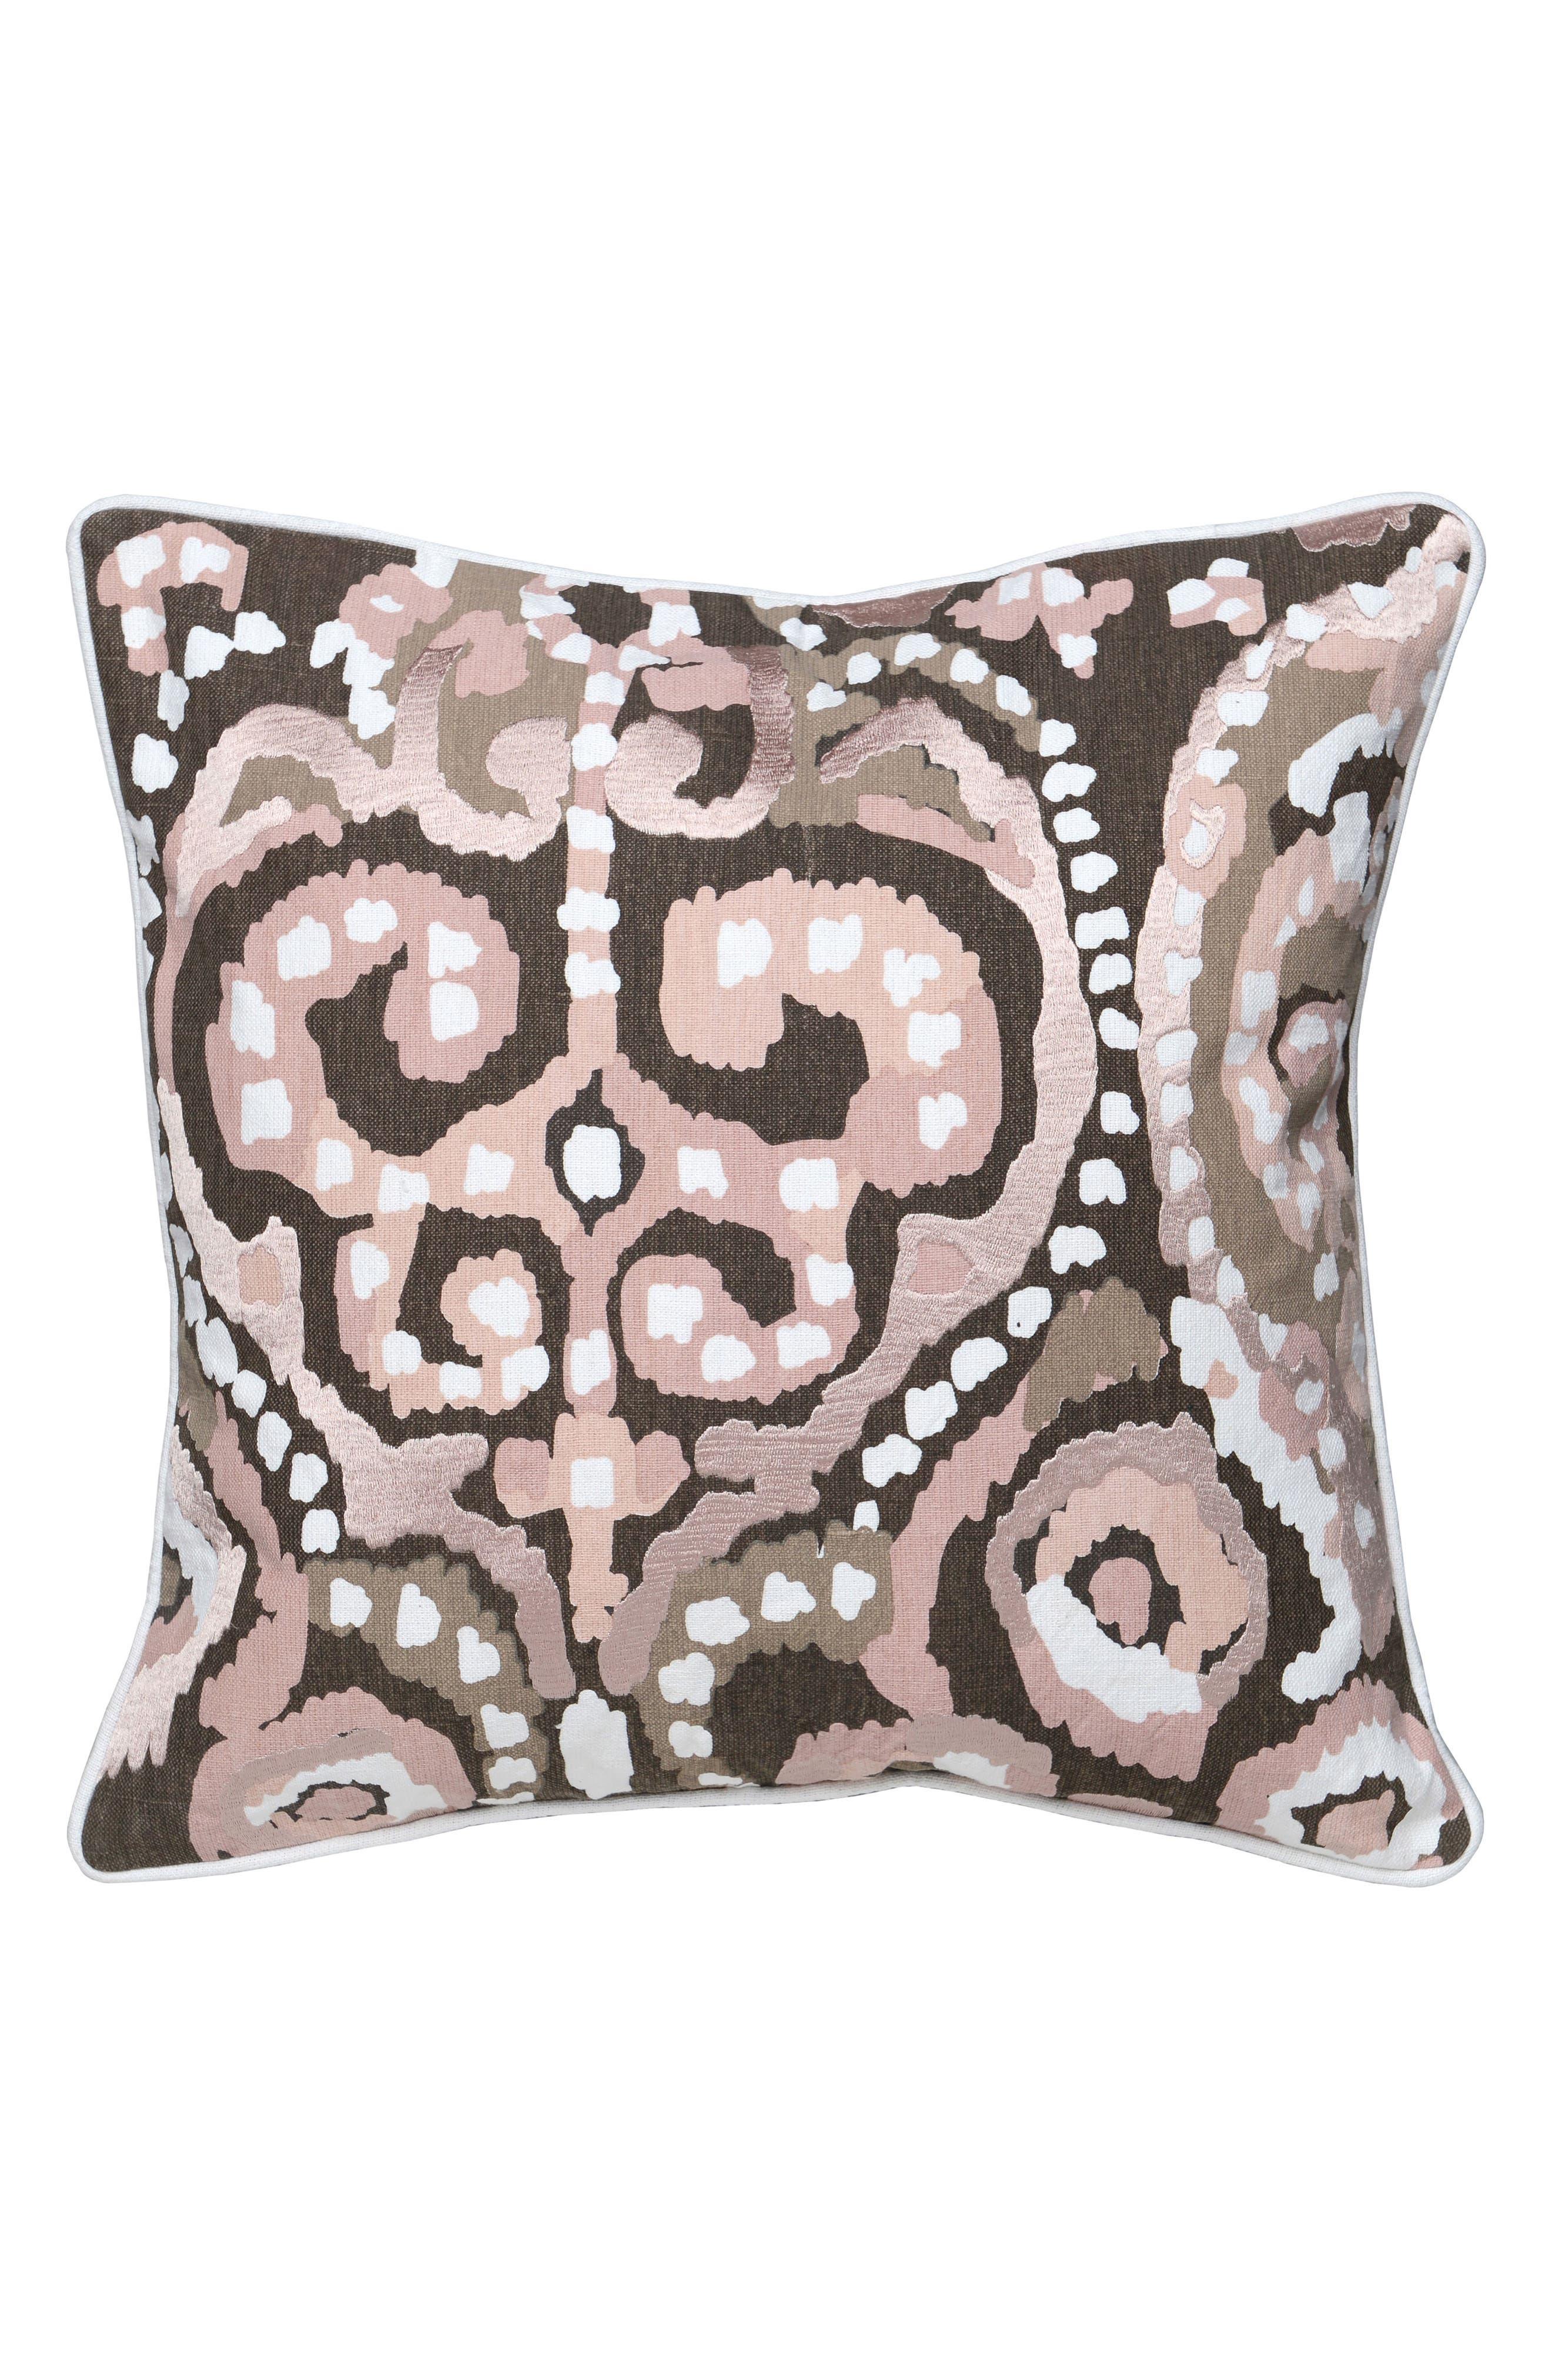 Mina Accent Pillow,                             Main thumbnail 1, color,                             BLUSH/ BROWN